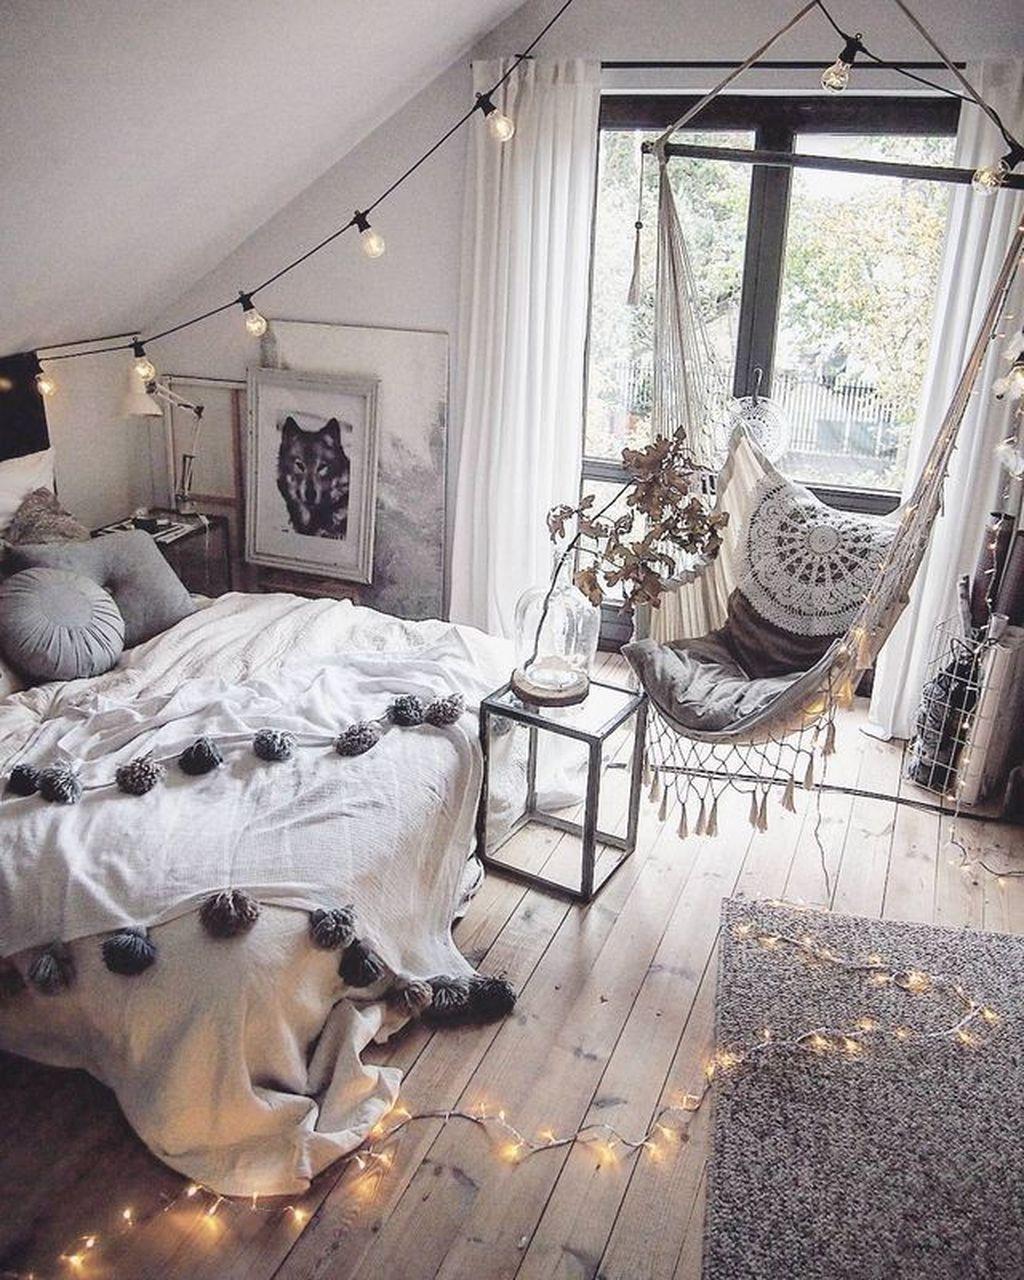 Creative bedroom decor ideas  creative diy apartment décor ideas  apartment design  pinterest